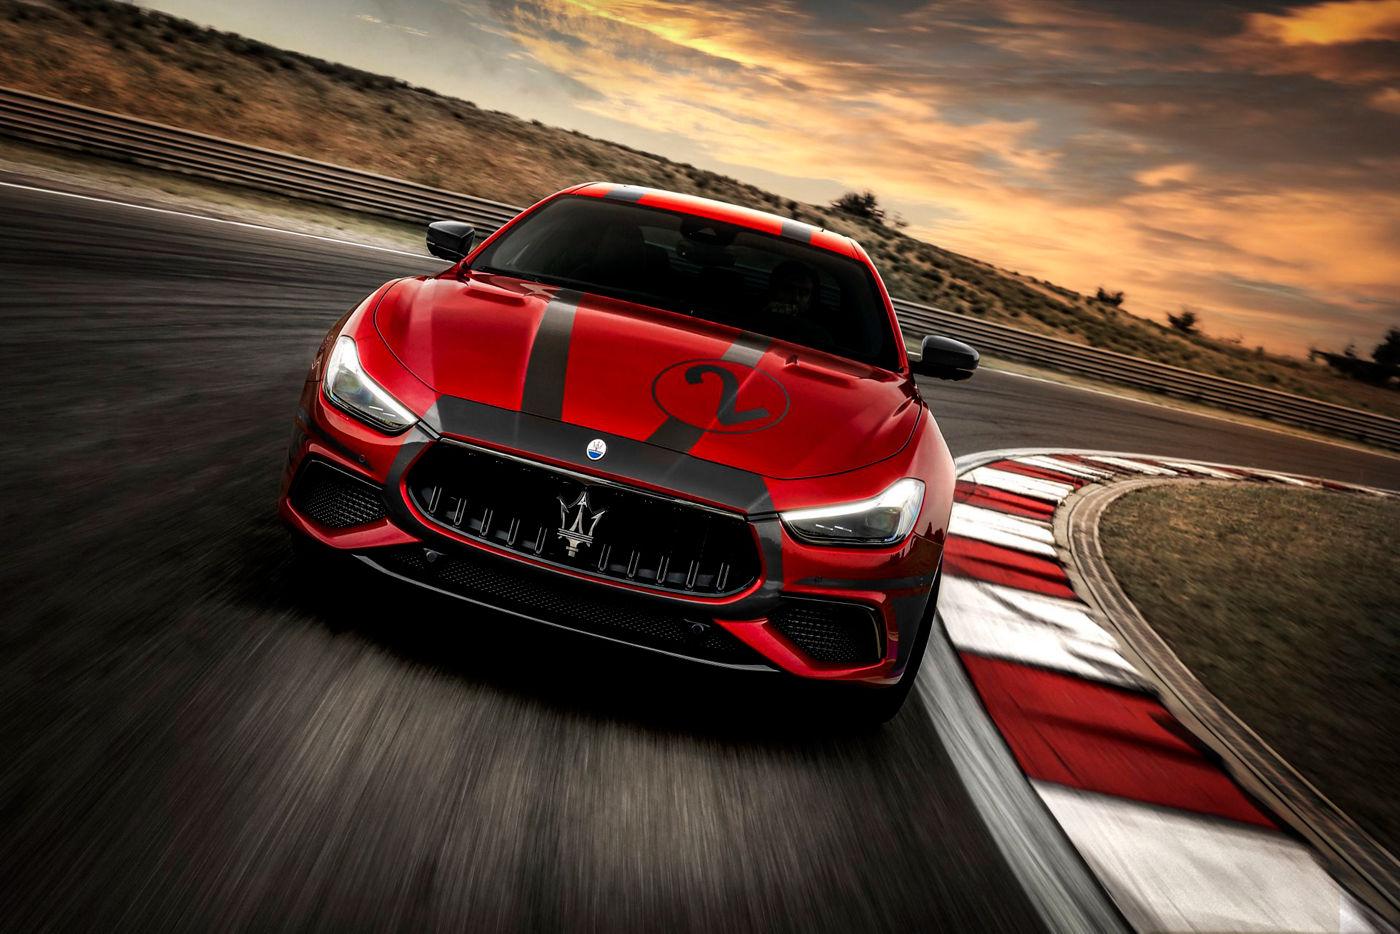 Maserati Ghibli Trofeo auf der Rennstrecke - Maserati Fahrtraining